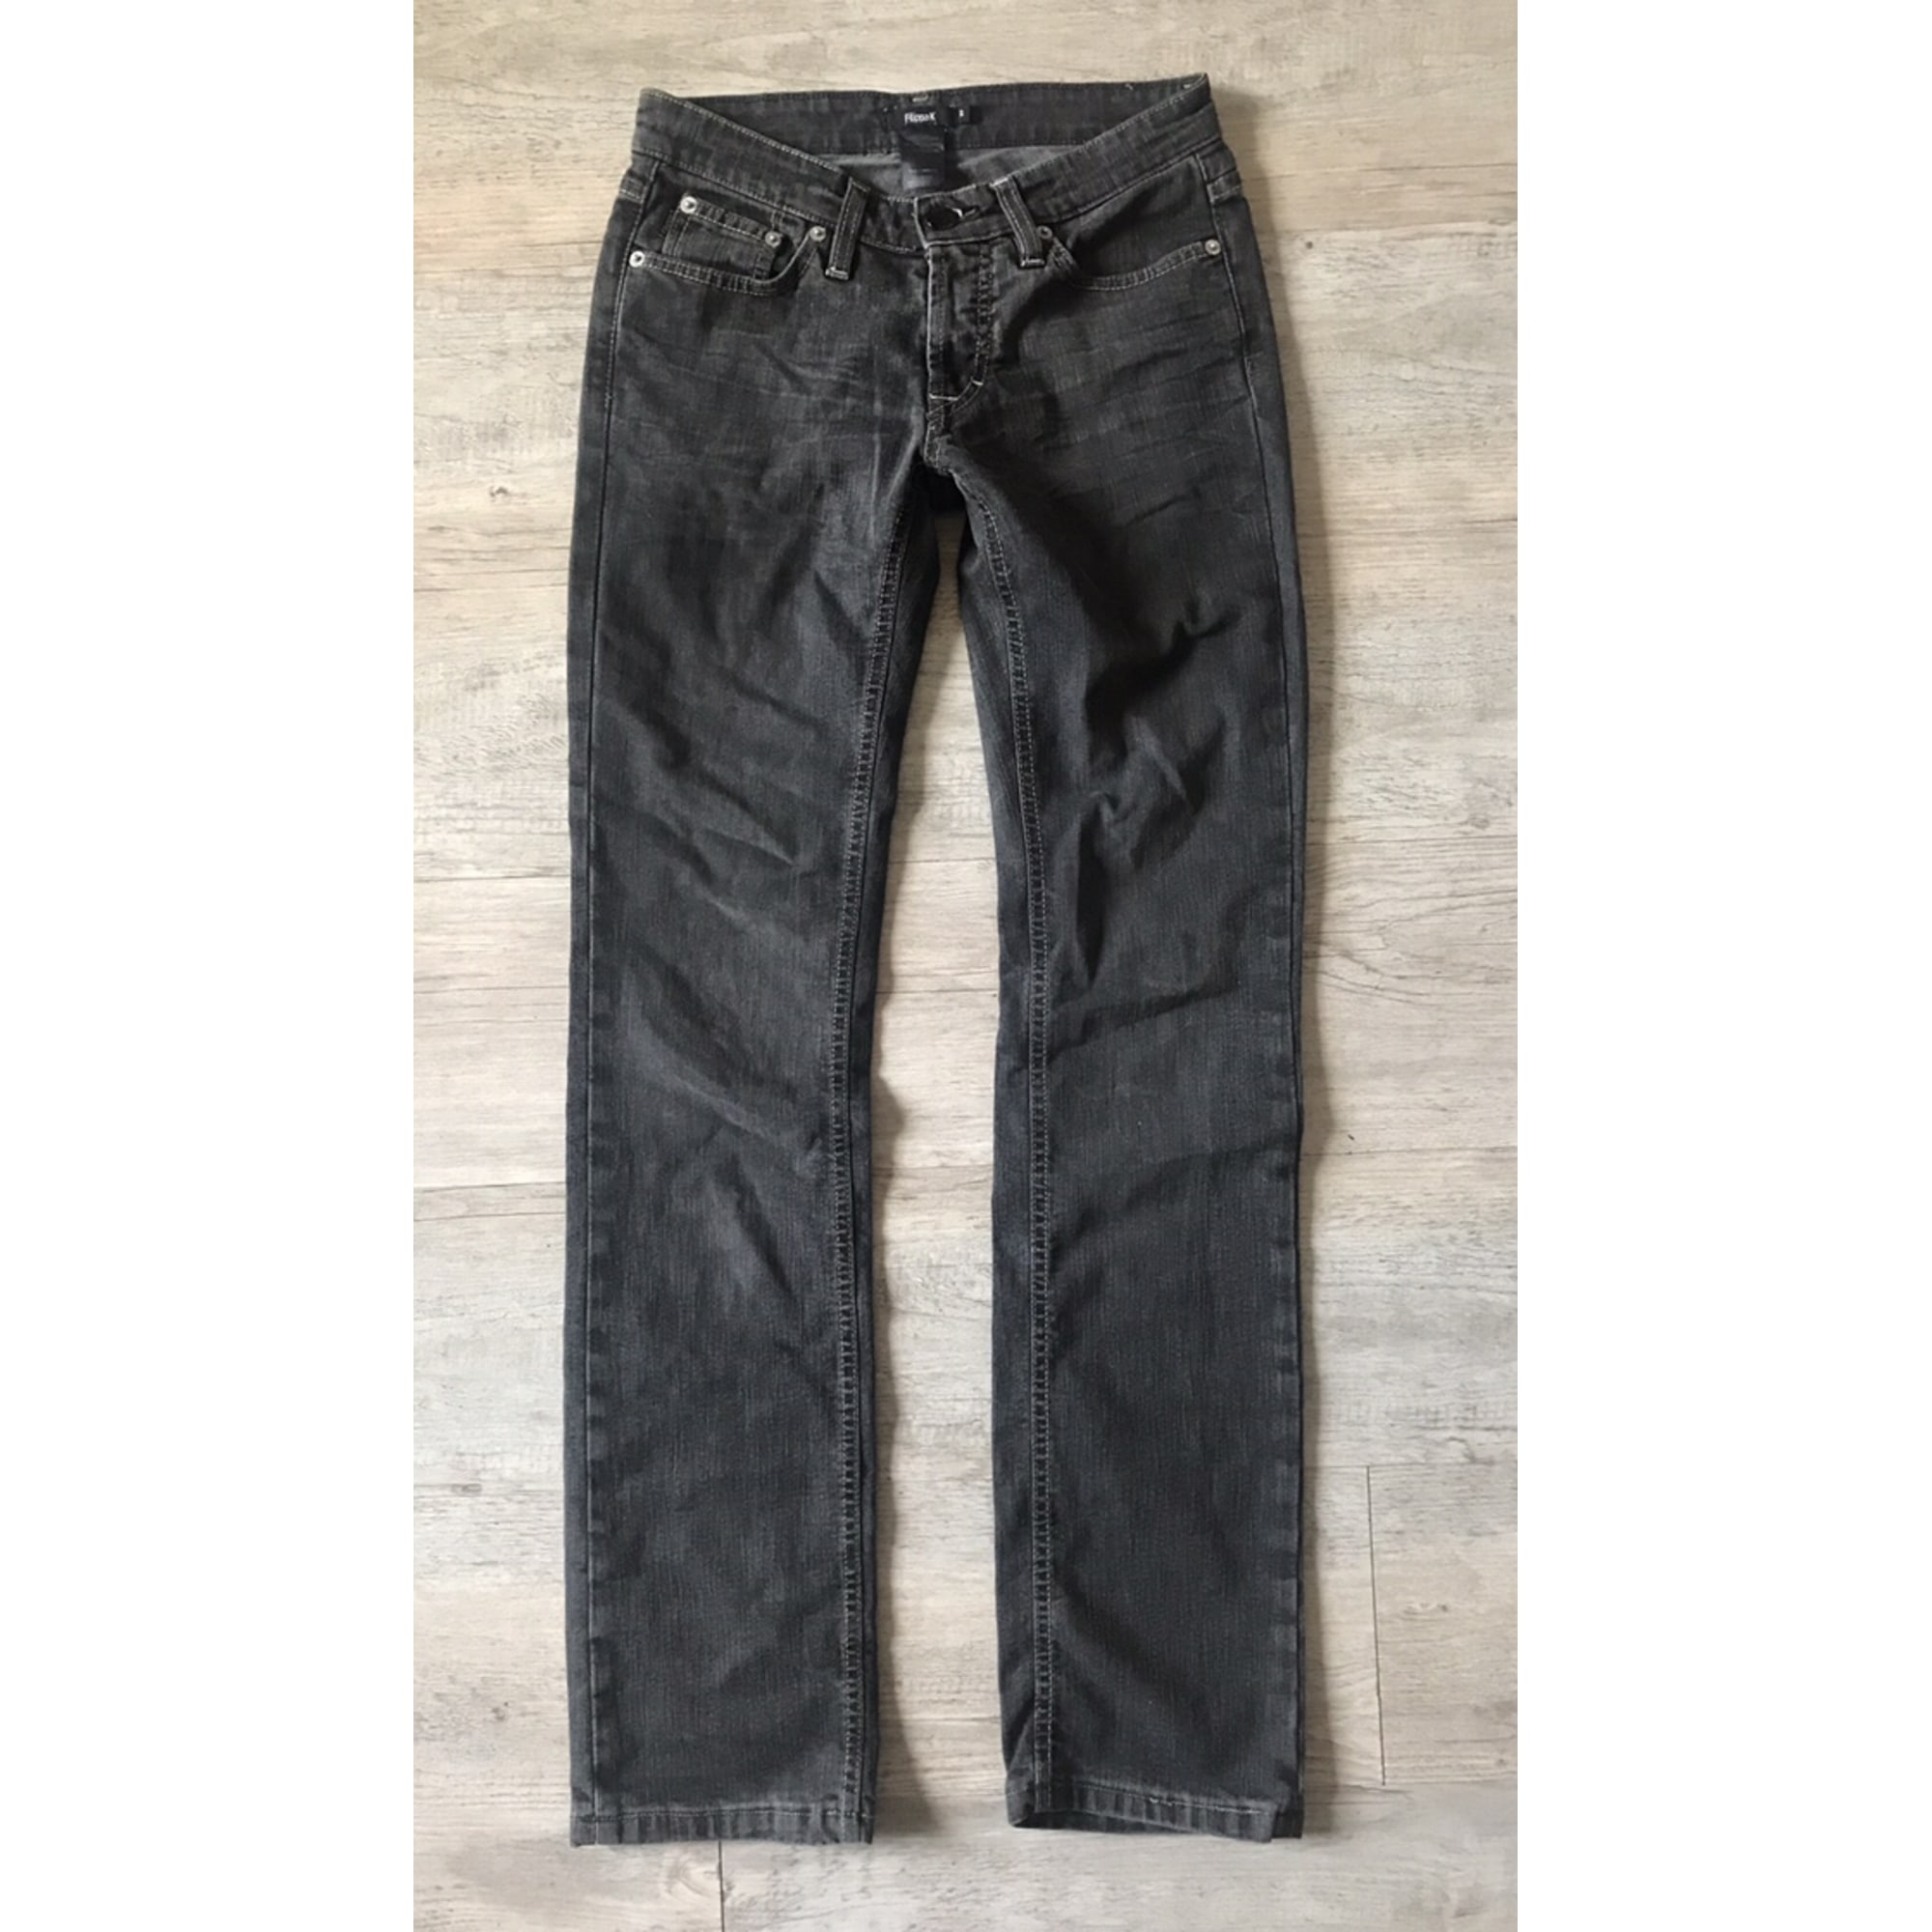 Jeans droit FILIPPA K Gris, anthracite